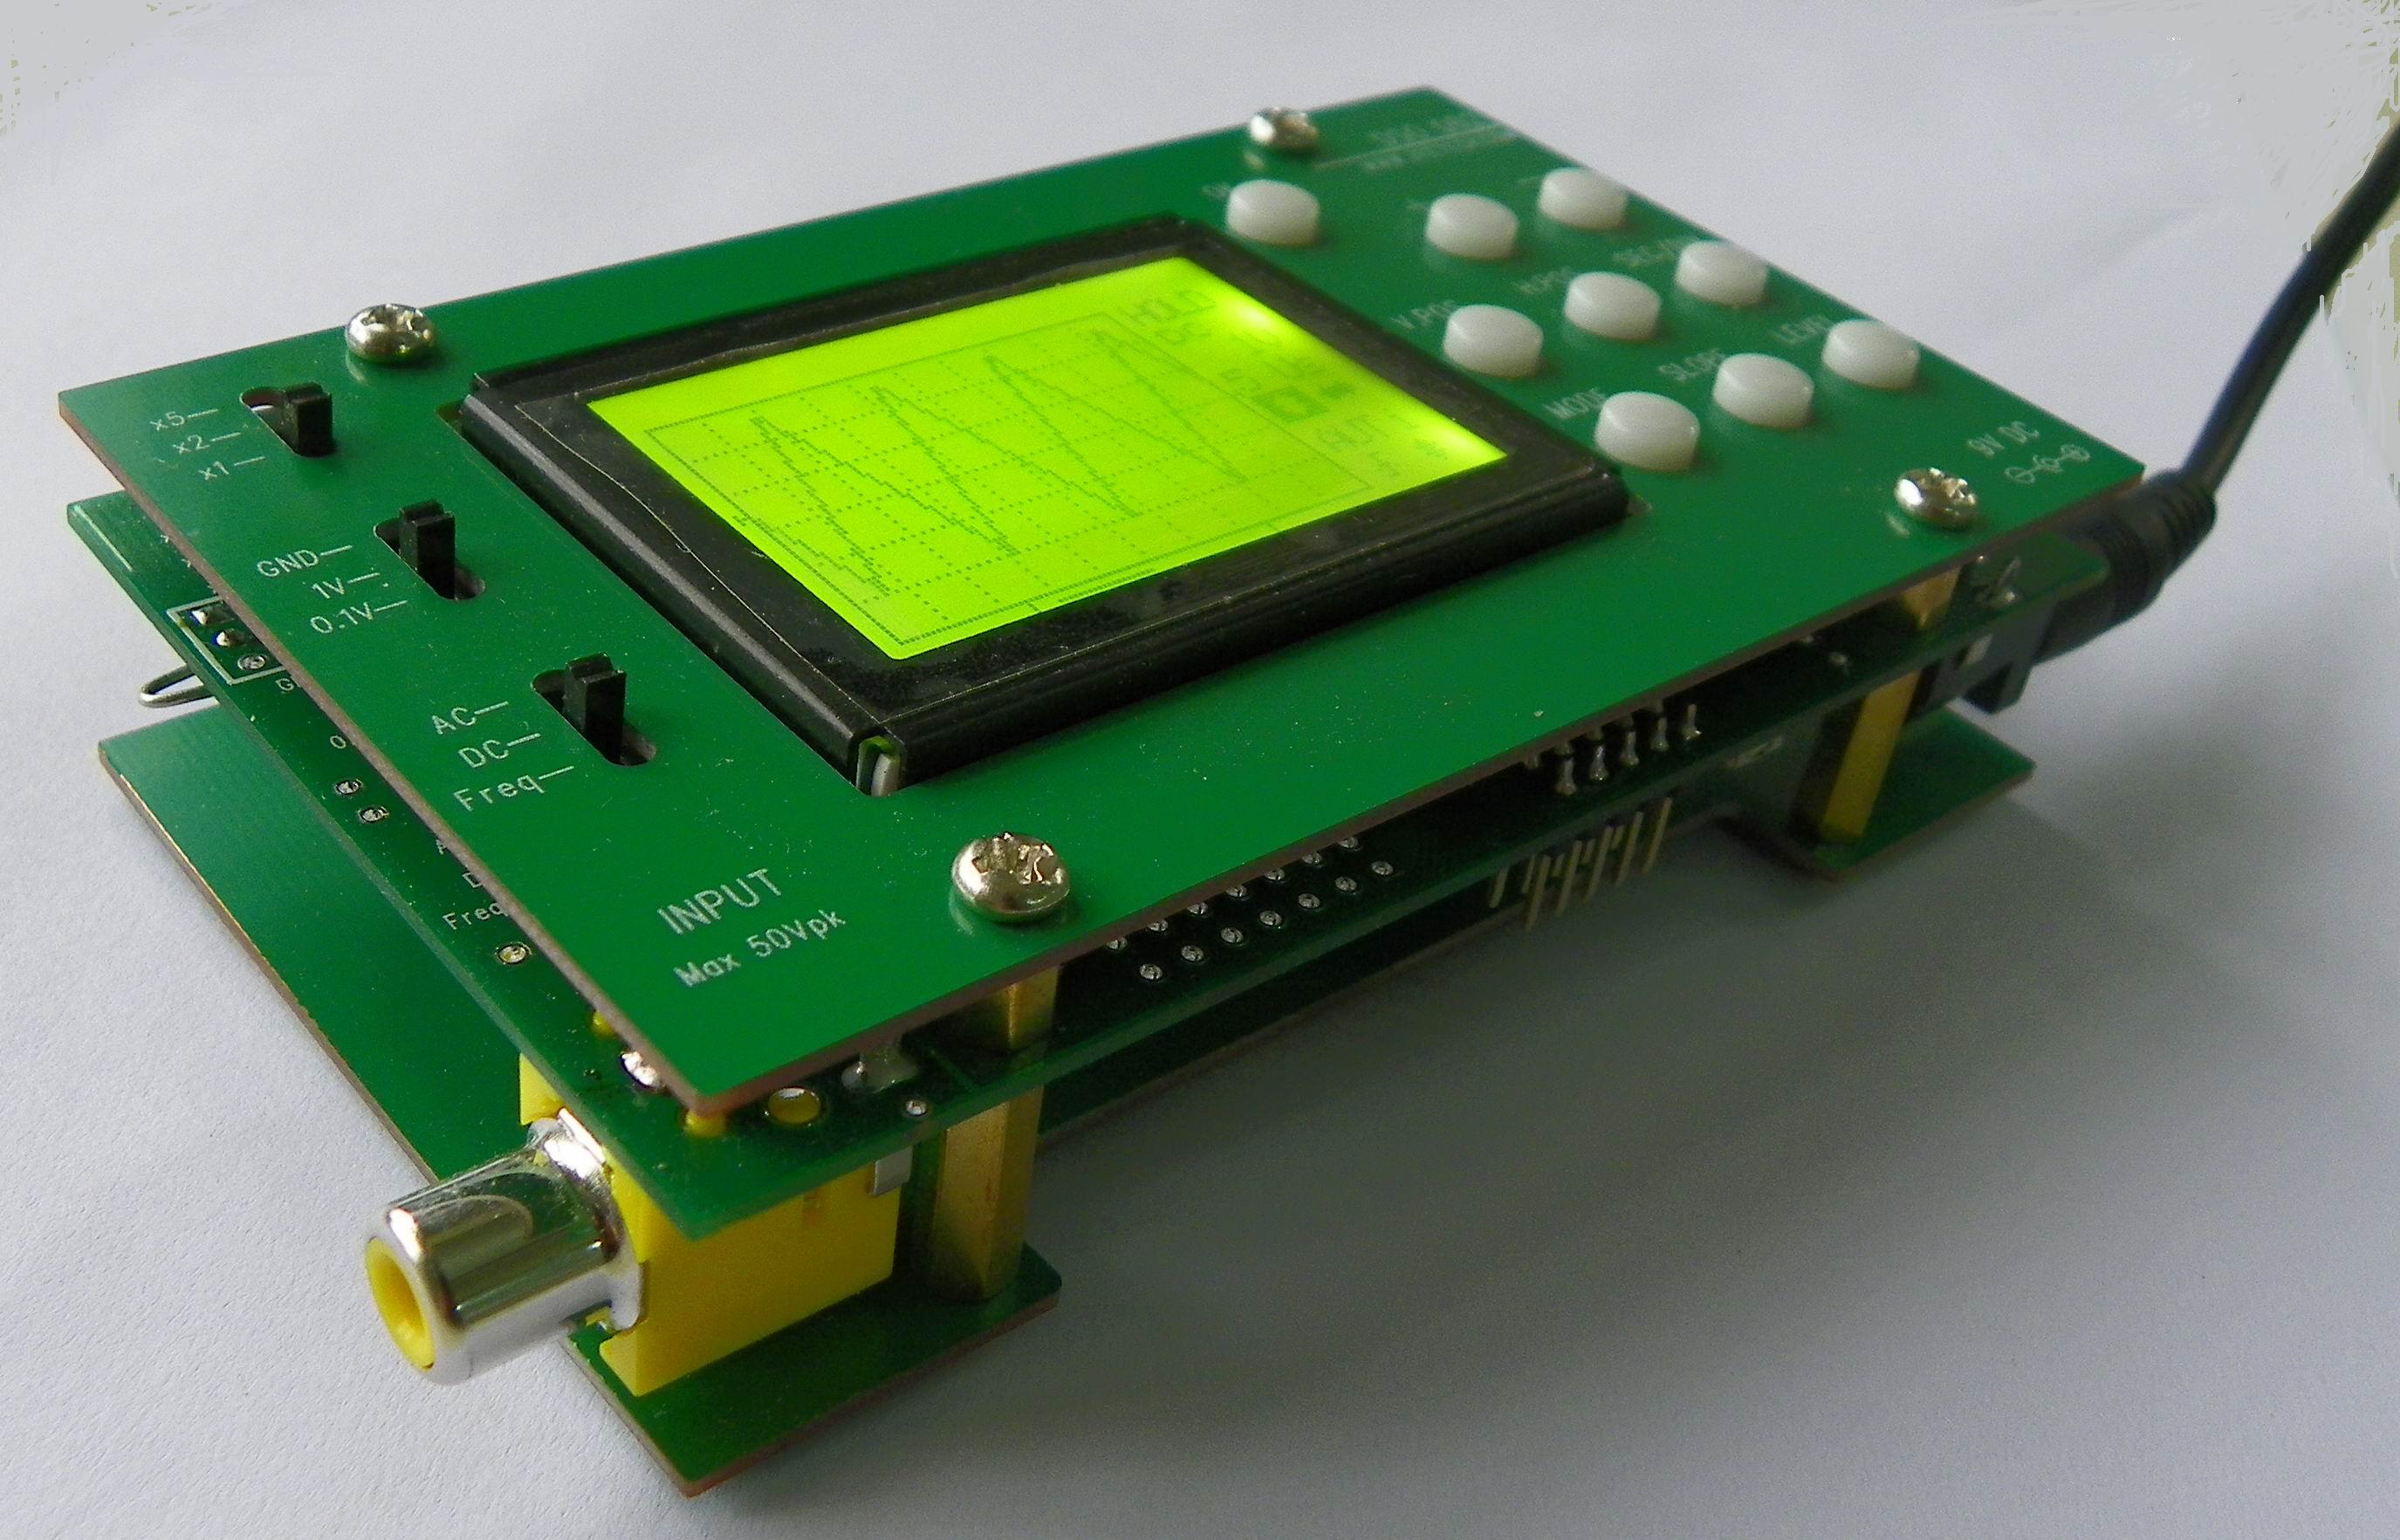 Jye Tech Diy Oscilloscopes Kits For Hobbyists Circuit Beginners Side View